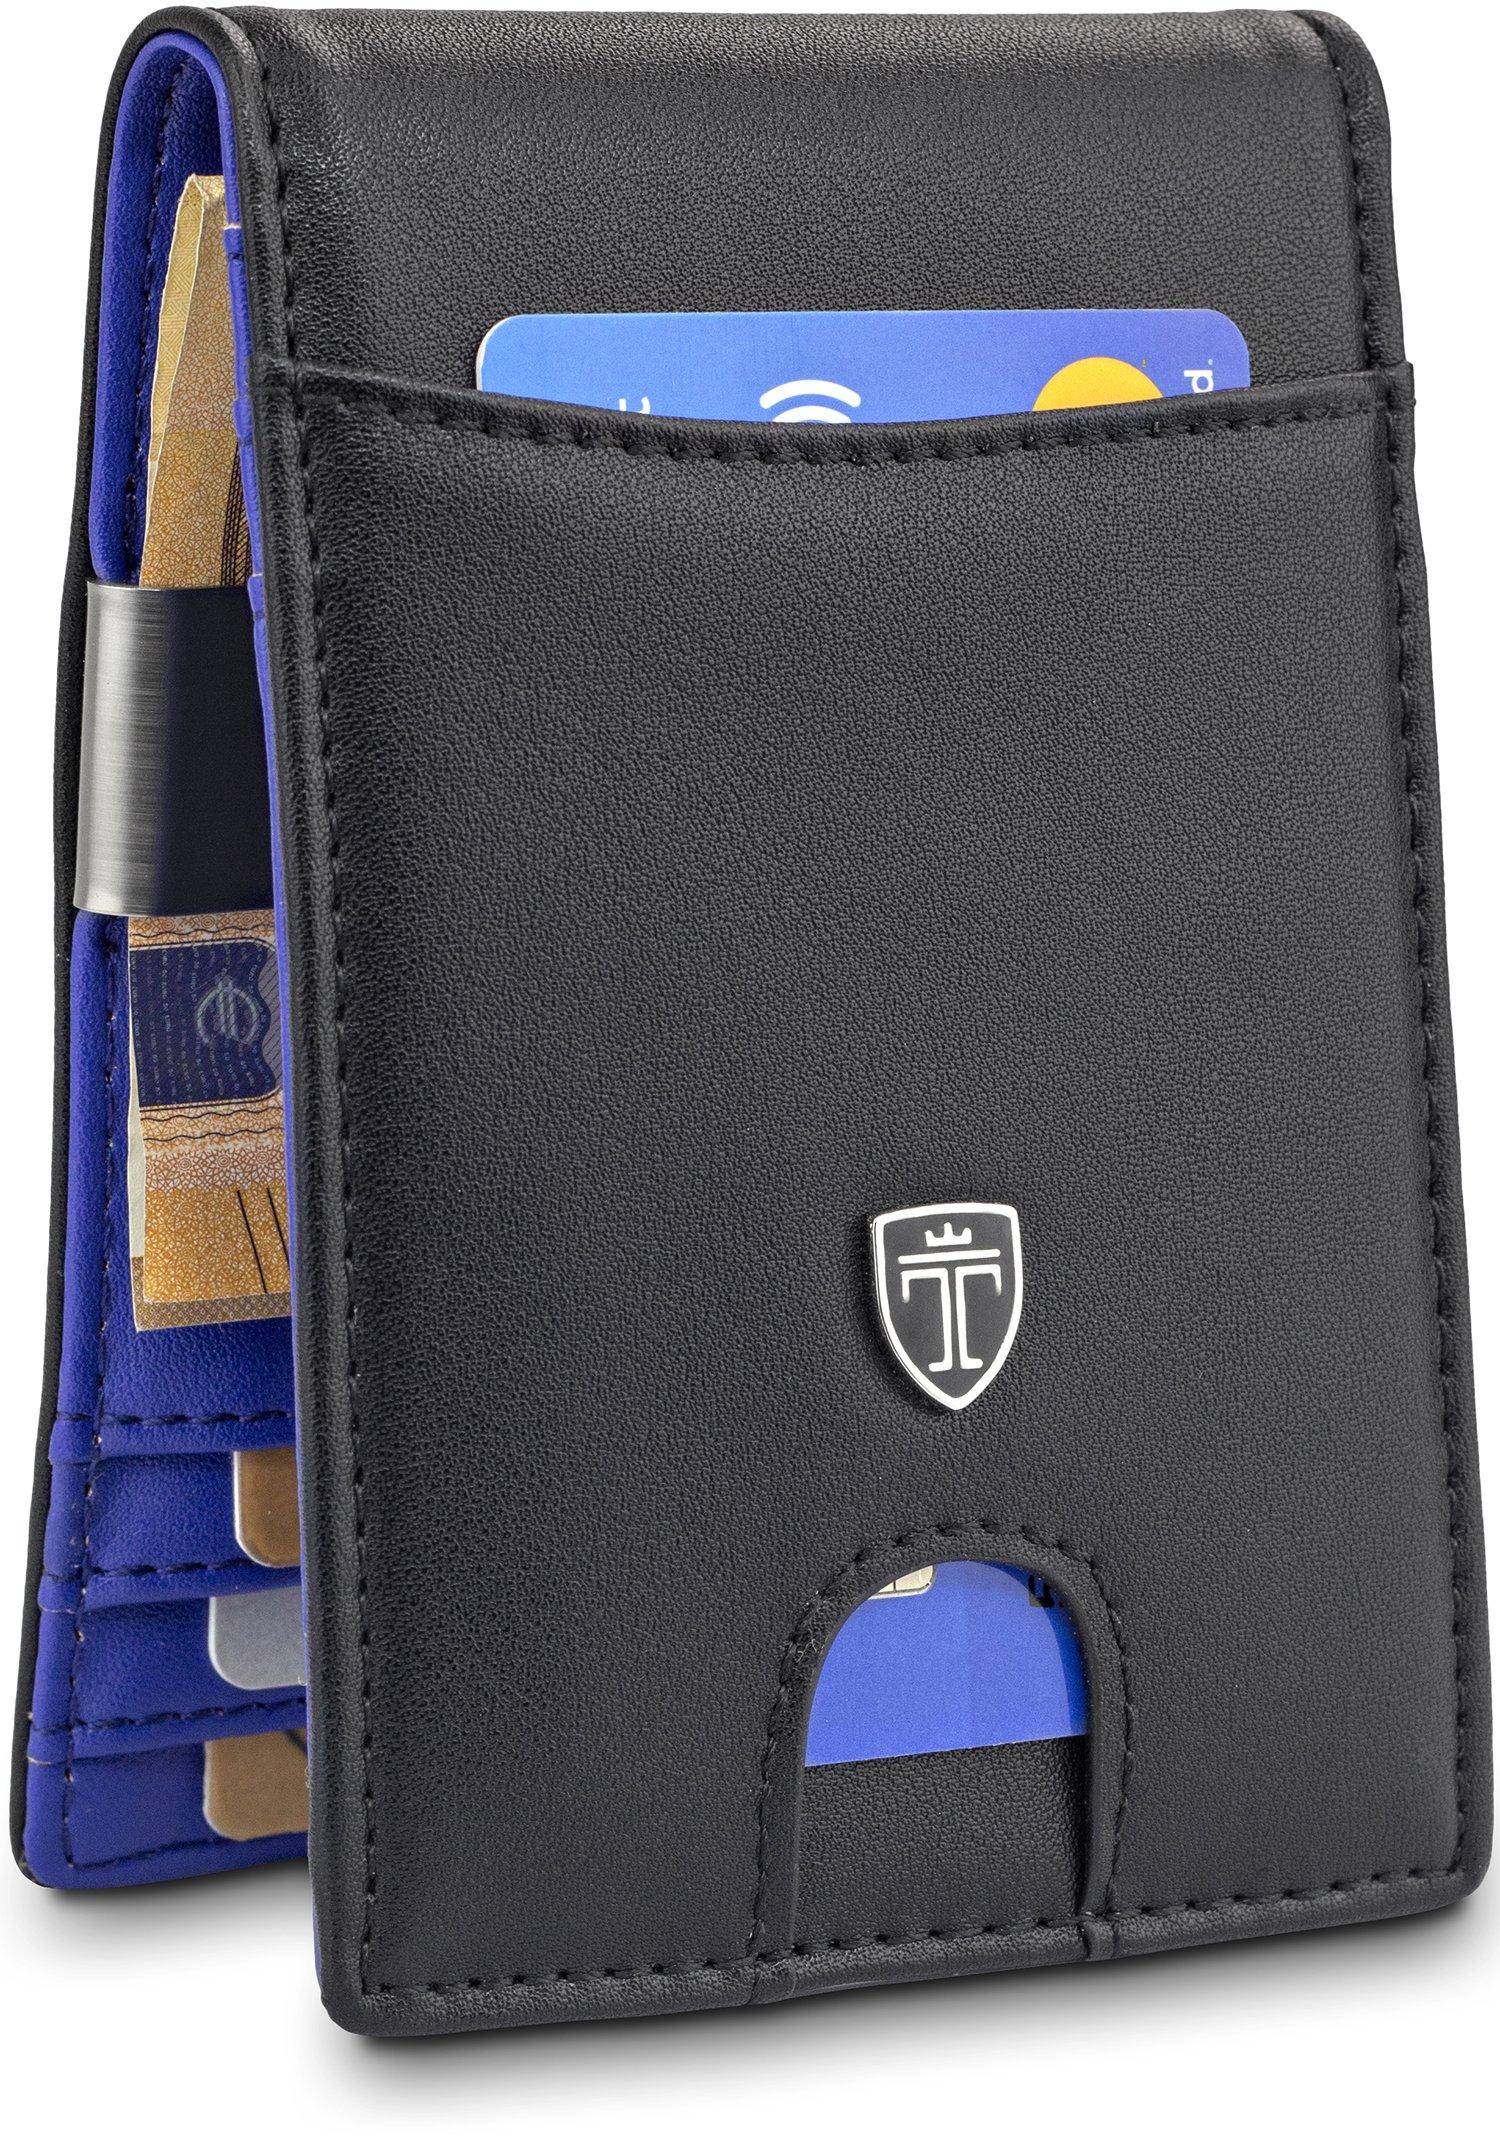 TRAVANDO Money Clip Wallet''RIO'' Mens Wallet Front Pocket Wallet Slim Wallet RFID Blocking | Credit Card Holder | Minimalist Mini Bifold Gifts for Men by Travando